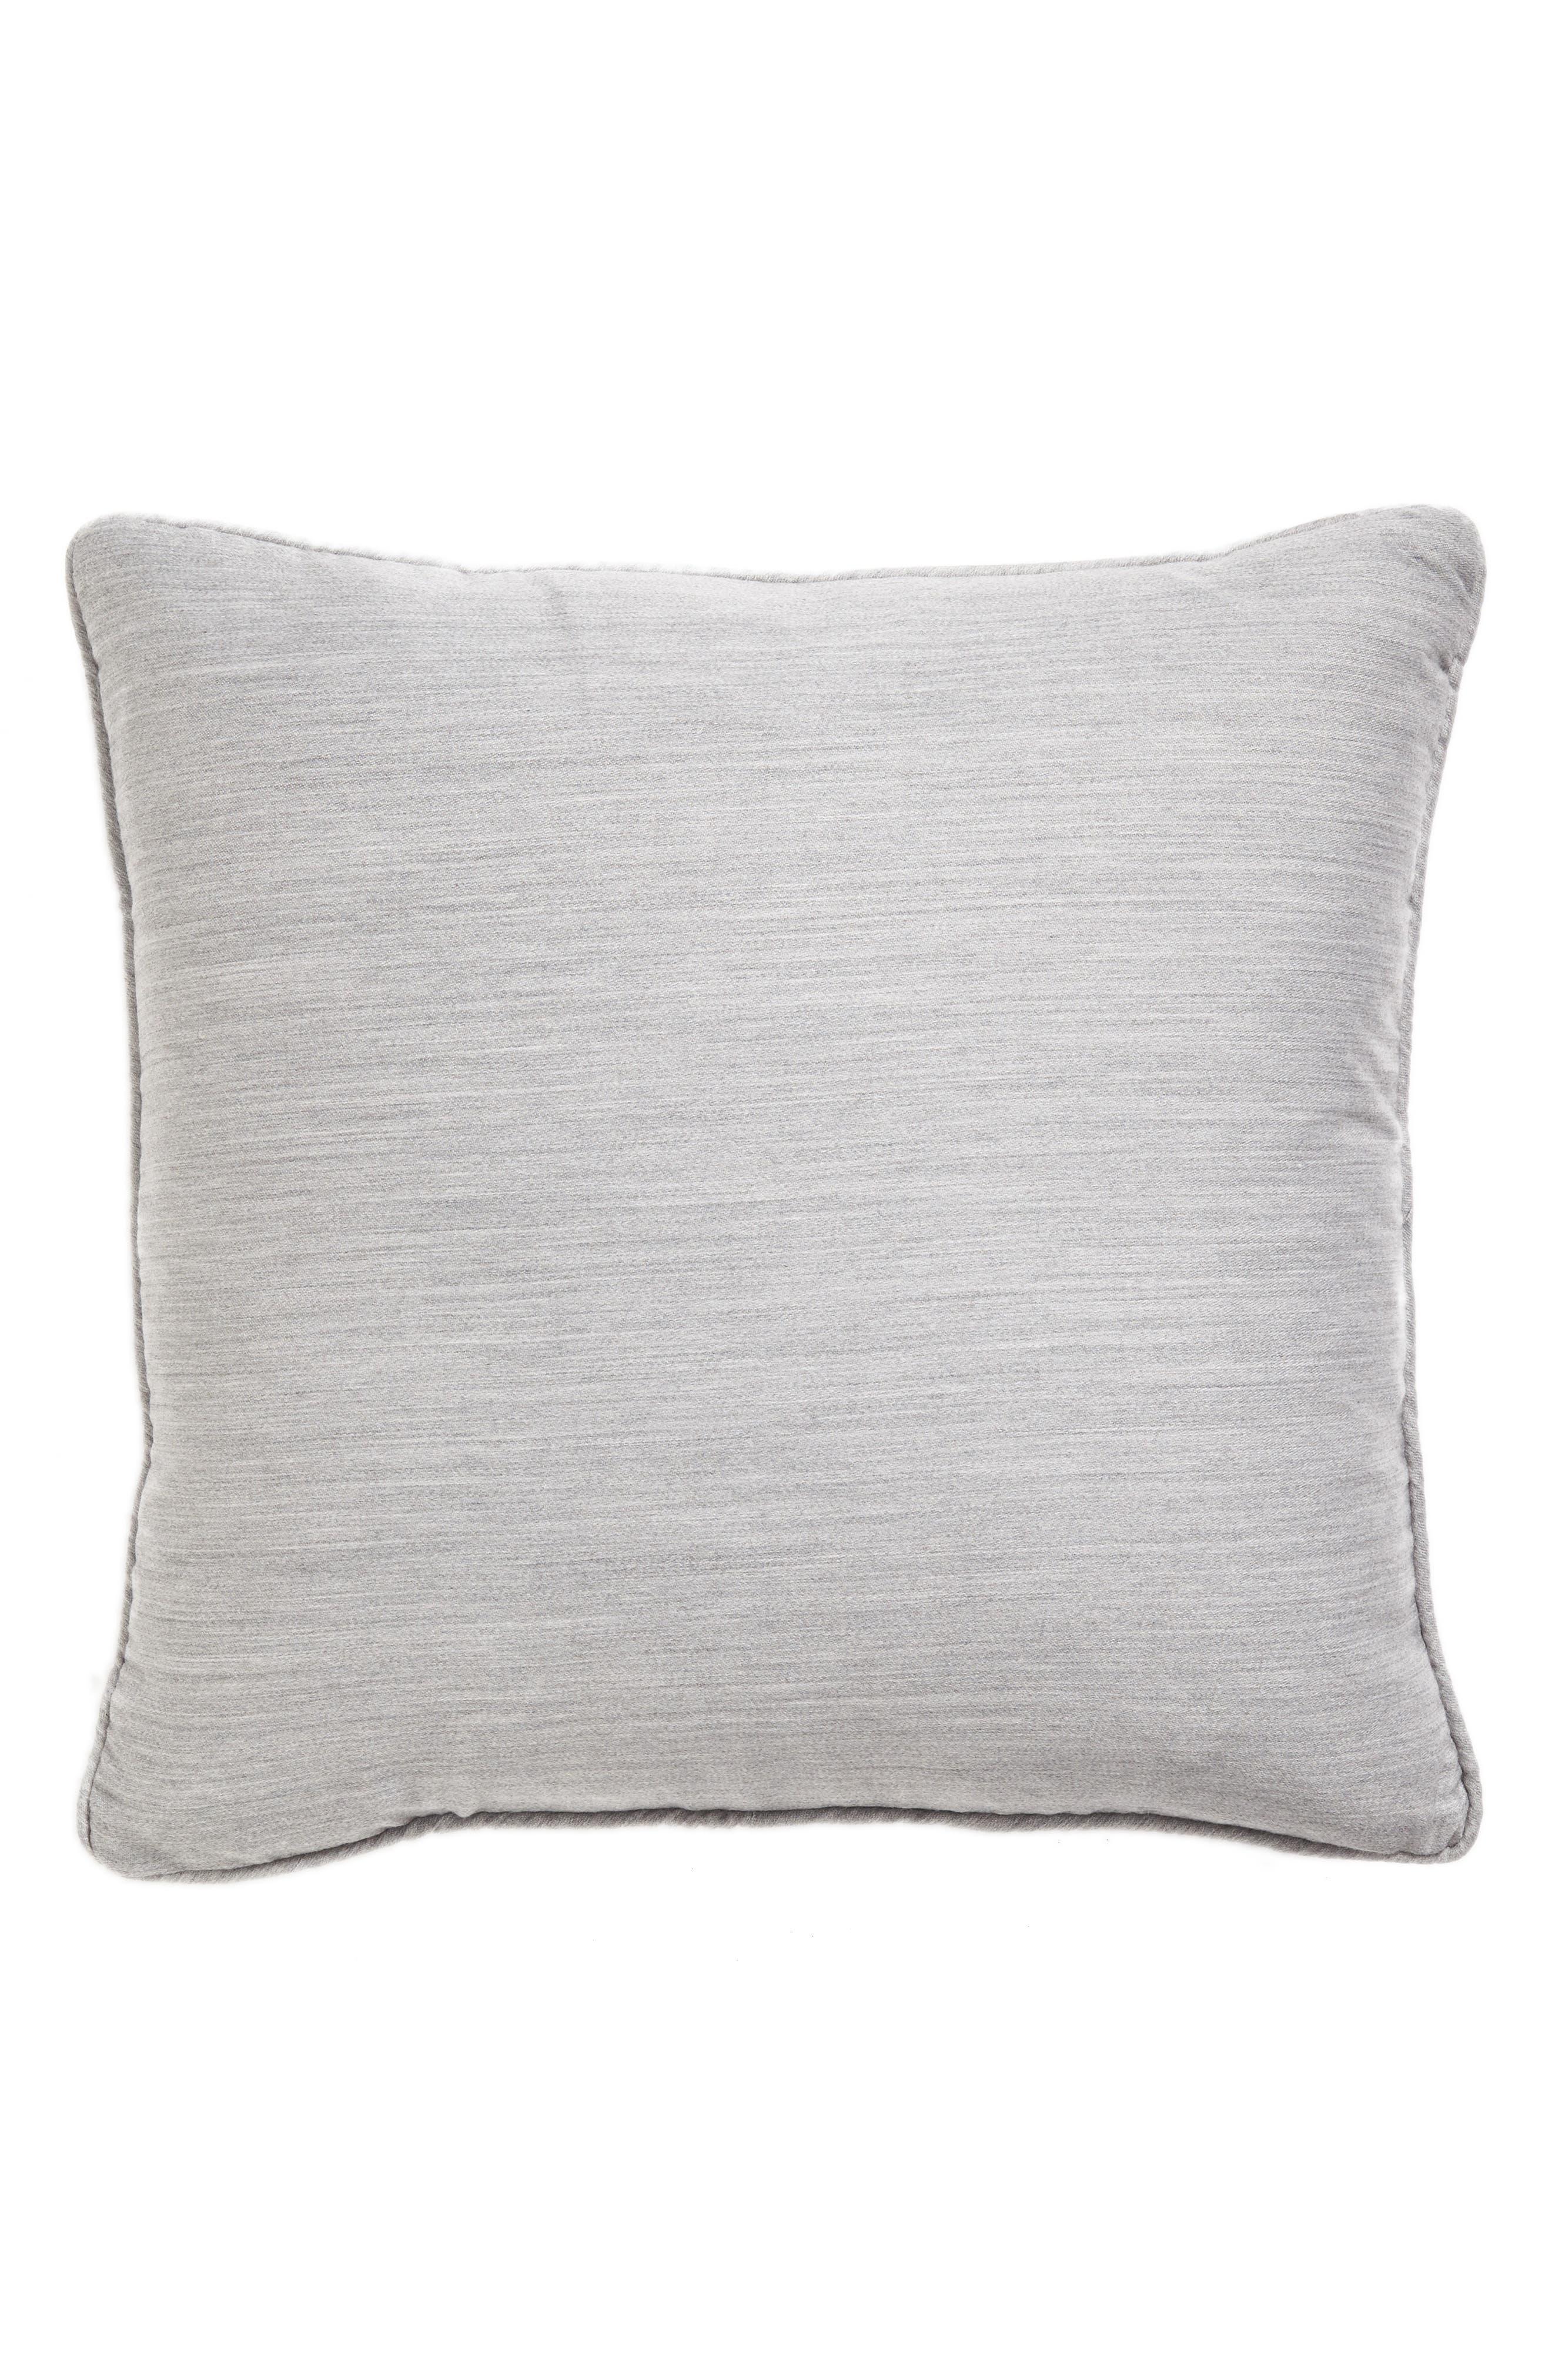 Brione Accent Pillow,                             Alternate thumbnail 2, color,                             ALUMINUM